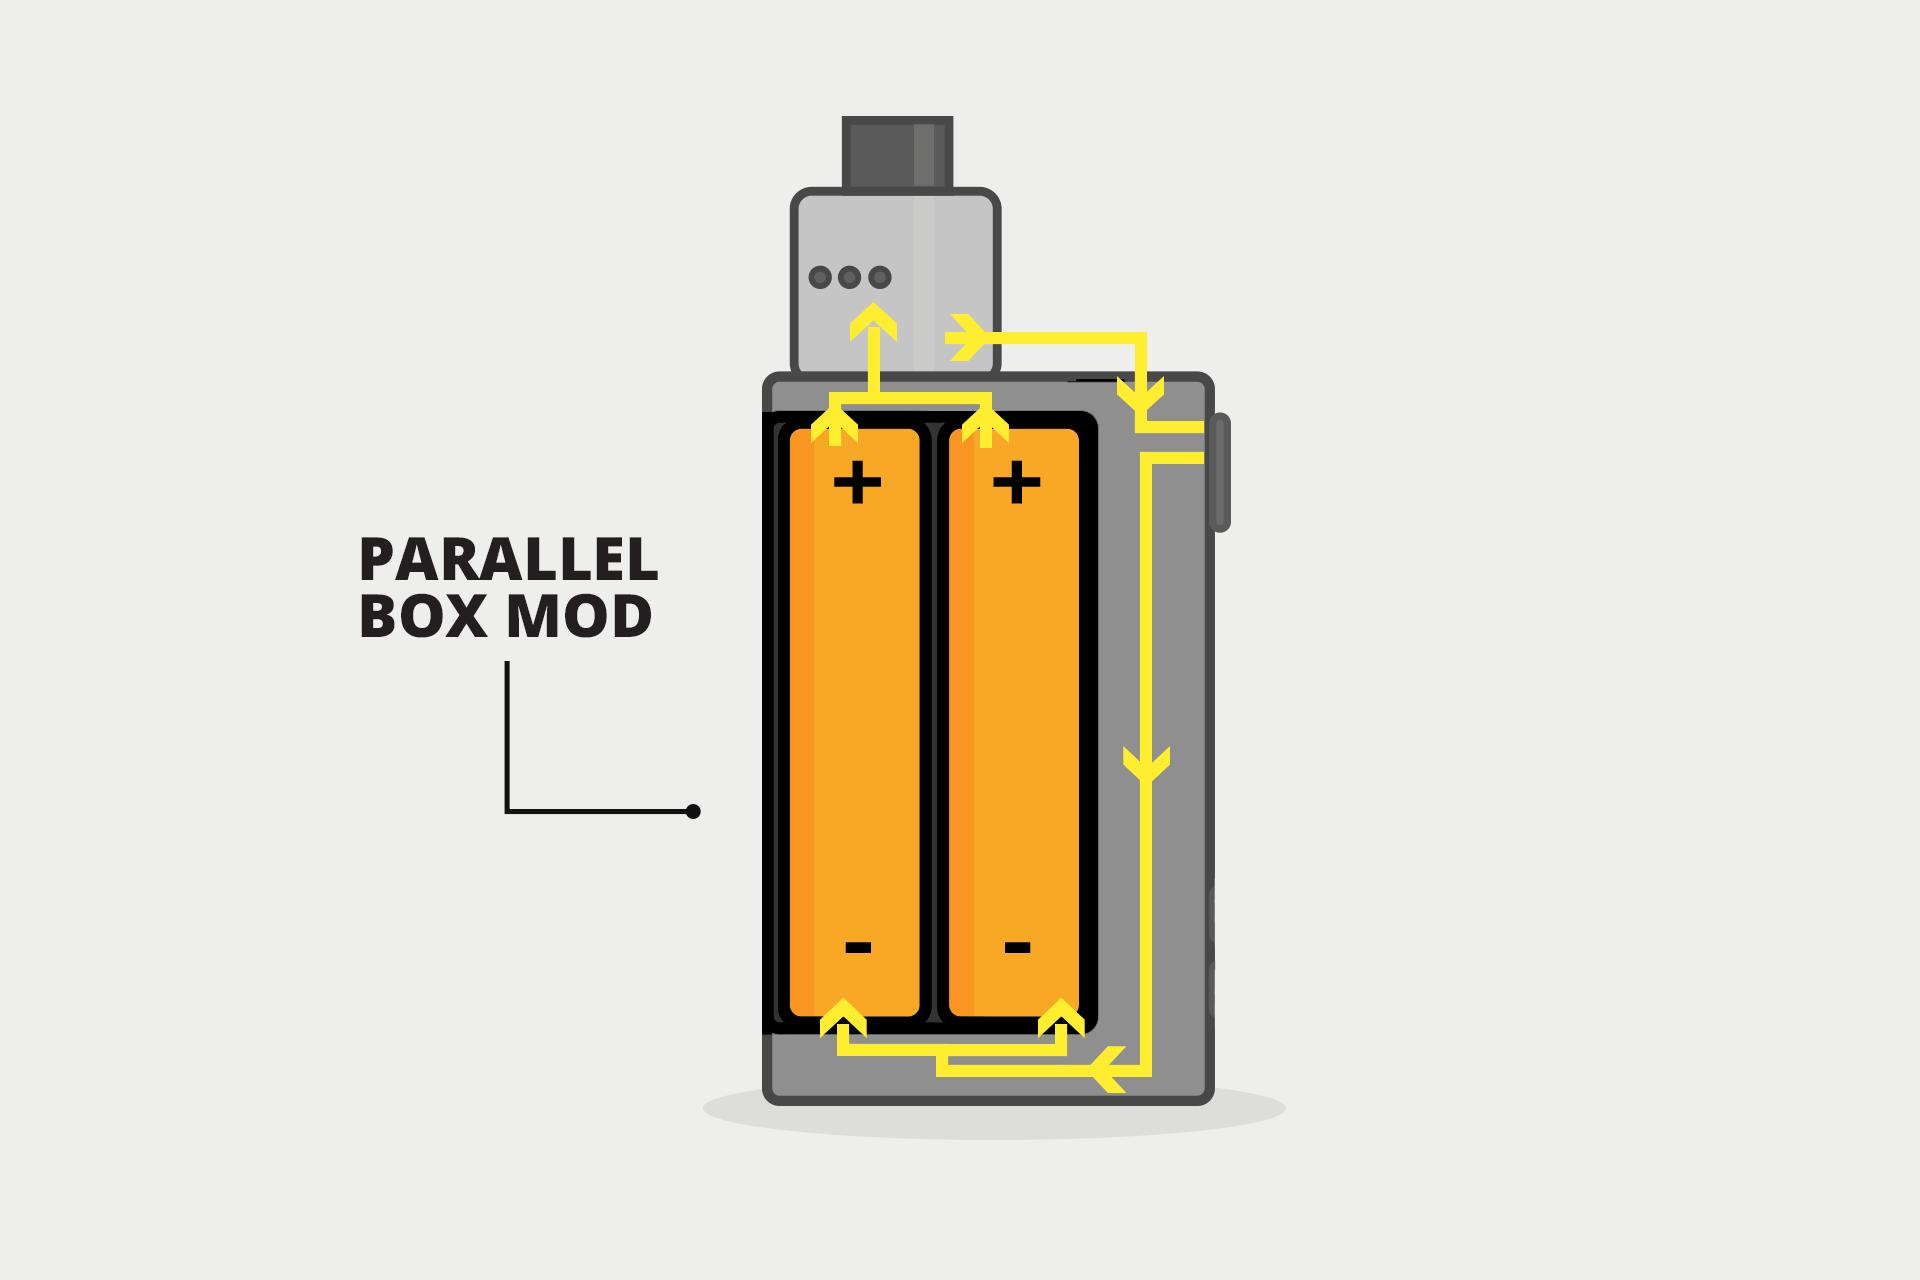 [SCHEMATICS_48DE]  Parallel vs. Series Mechanical Mods | Learn the Key Differences | Wiring Diagram Series Parallel Mod Vape |  | Alisons Heath Blog - blogger